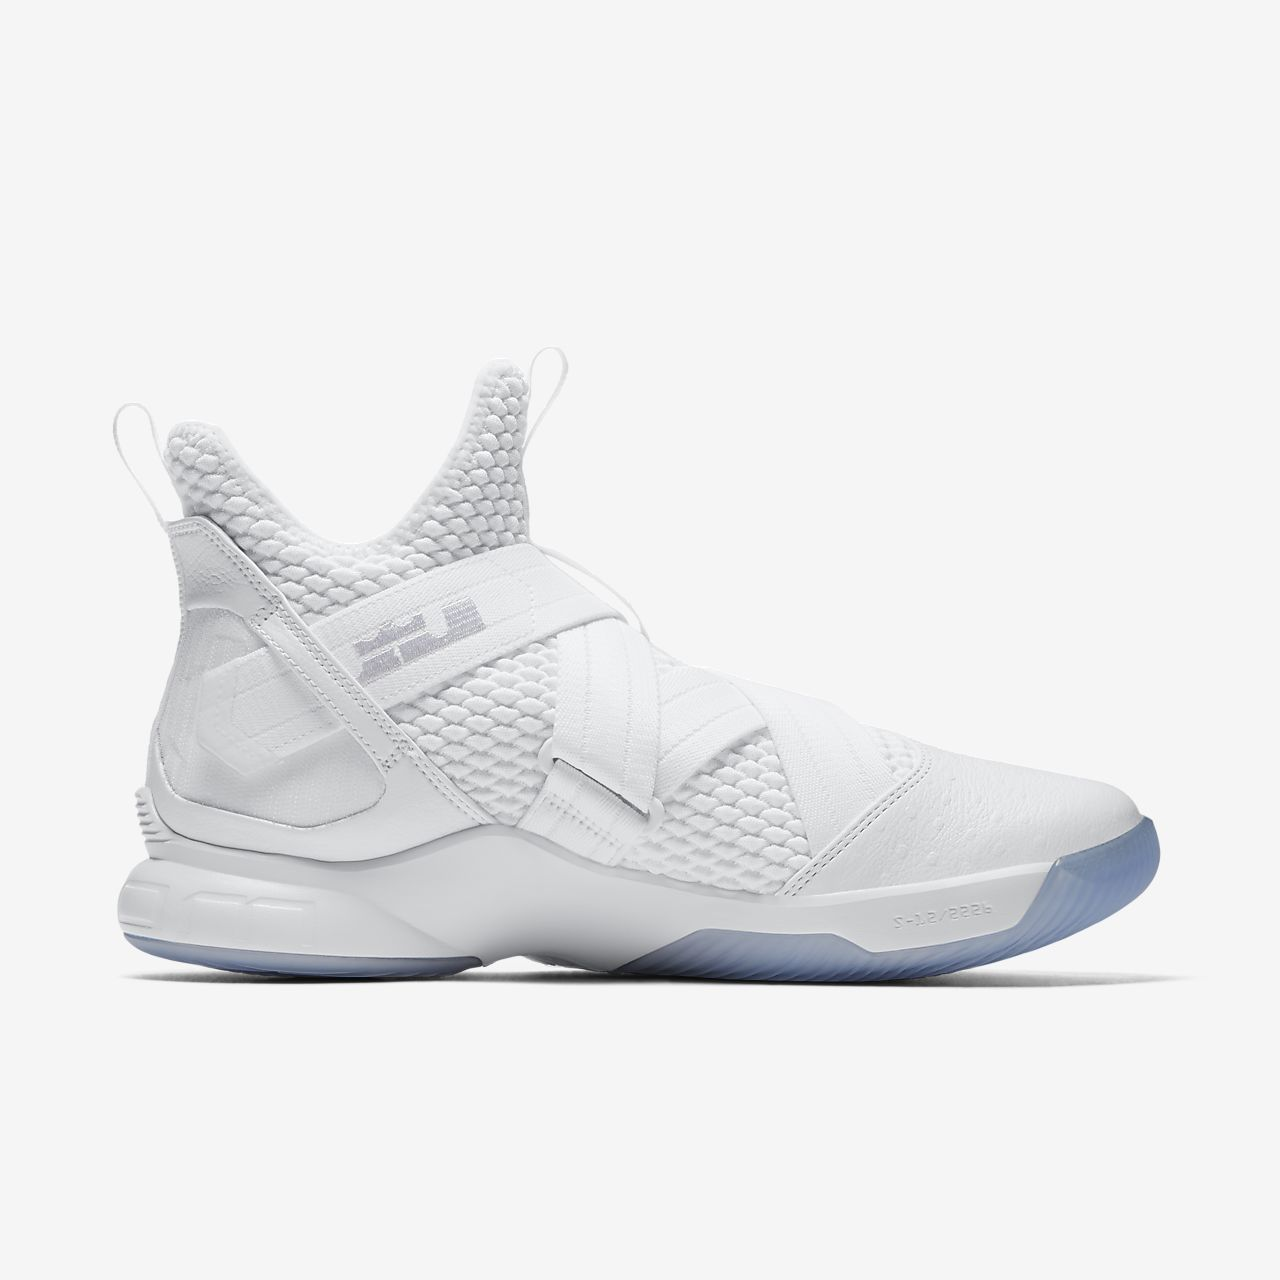 free shipping 4d21f 2d3d3 ... Chaussure de basketball LeBron Soldier 12 SFG